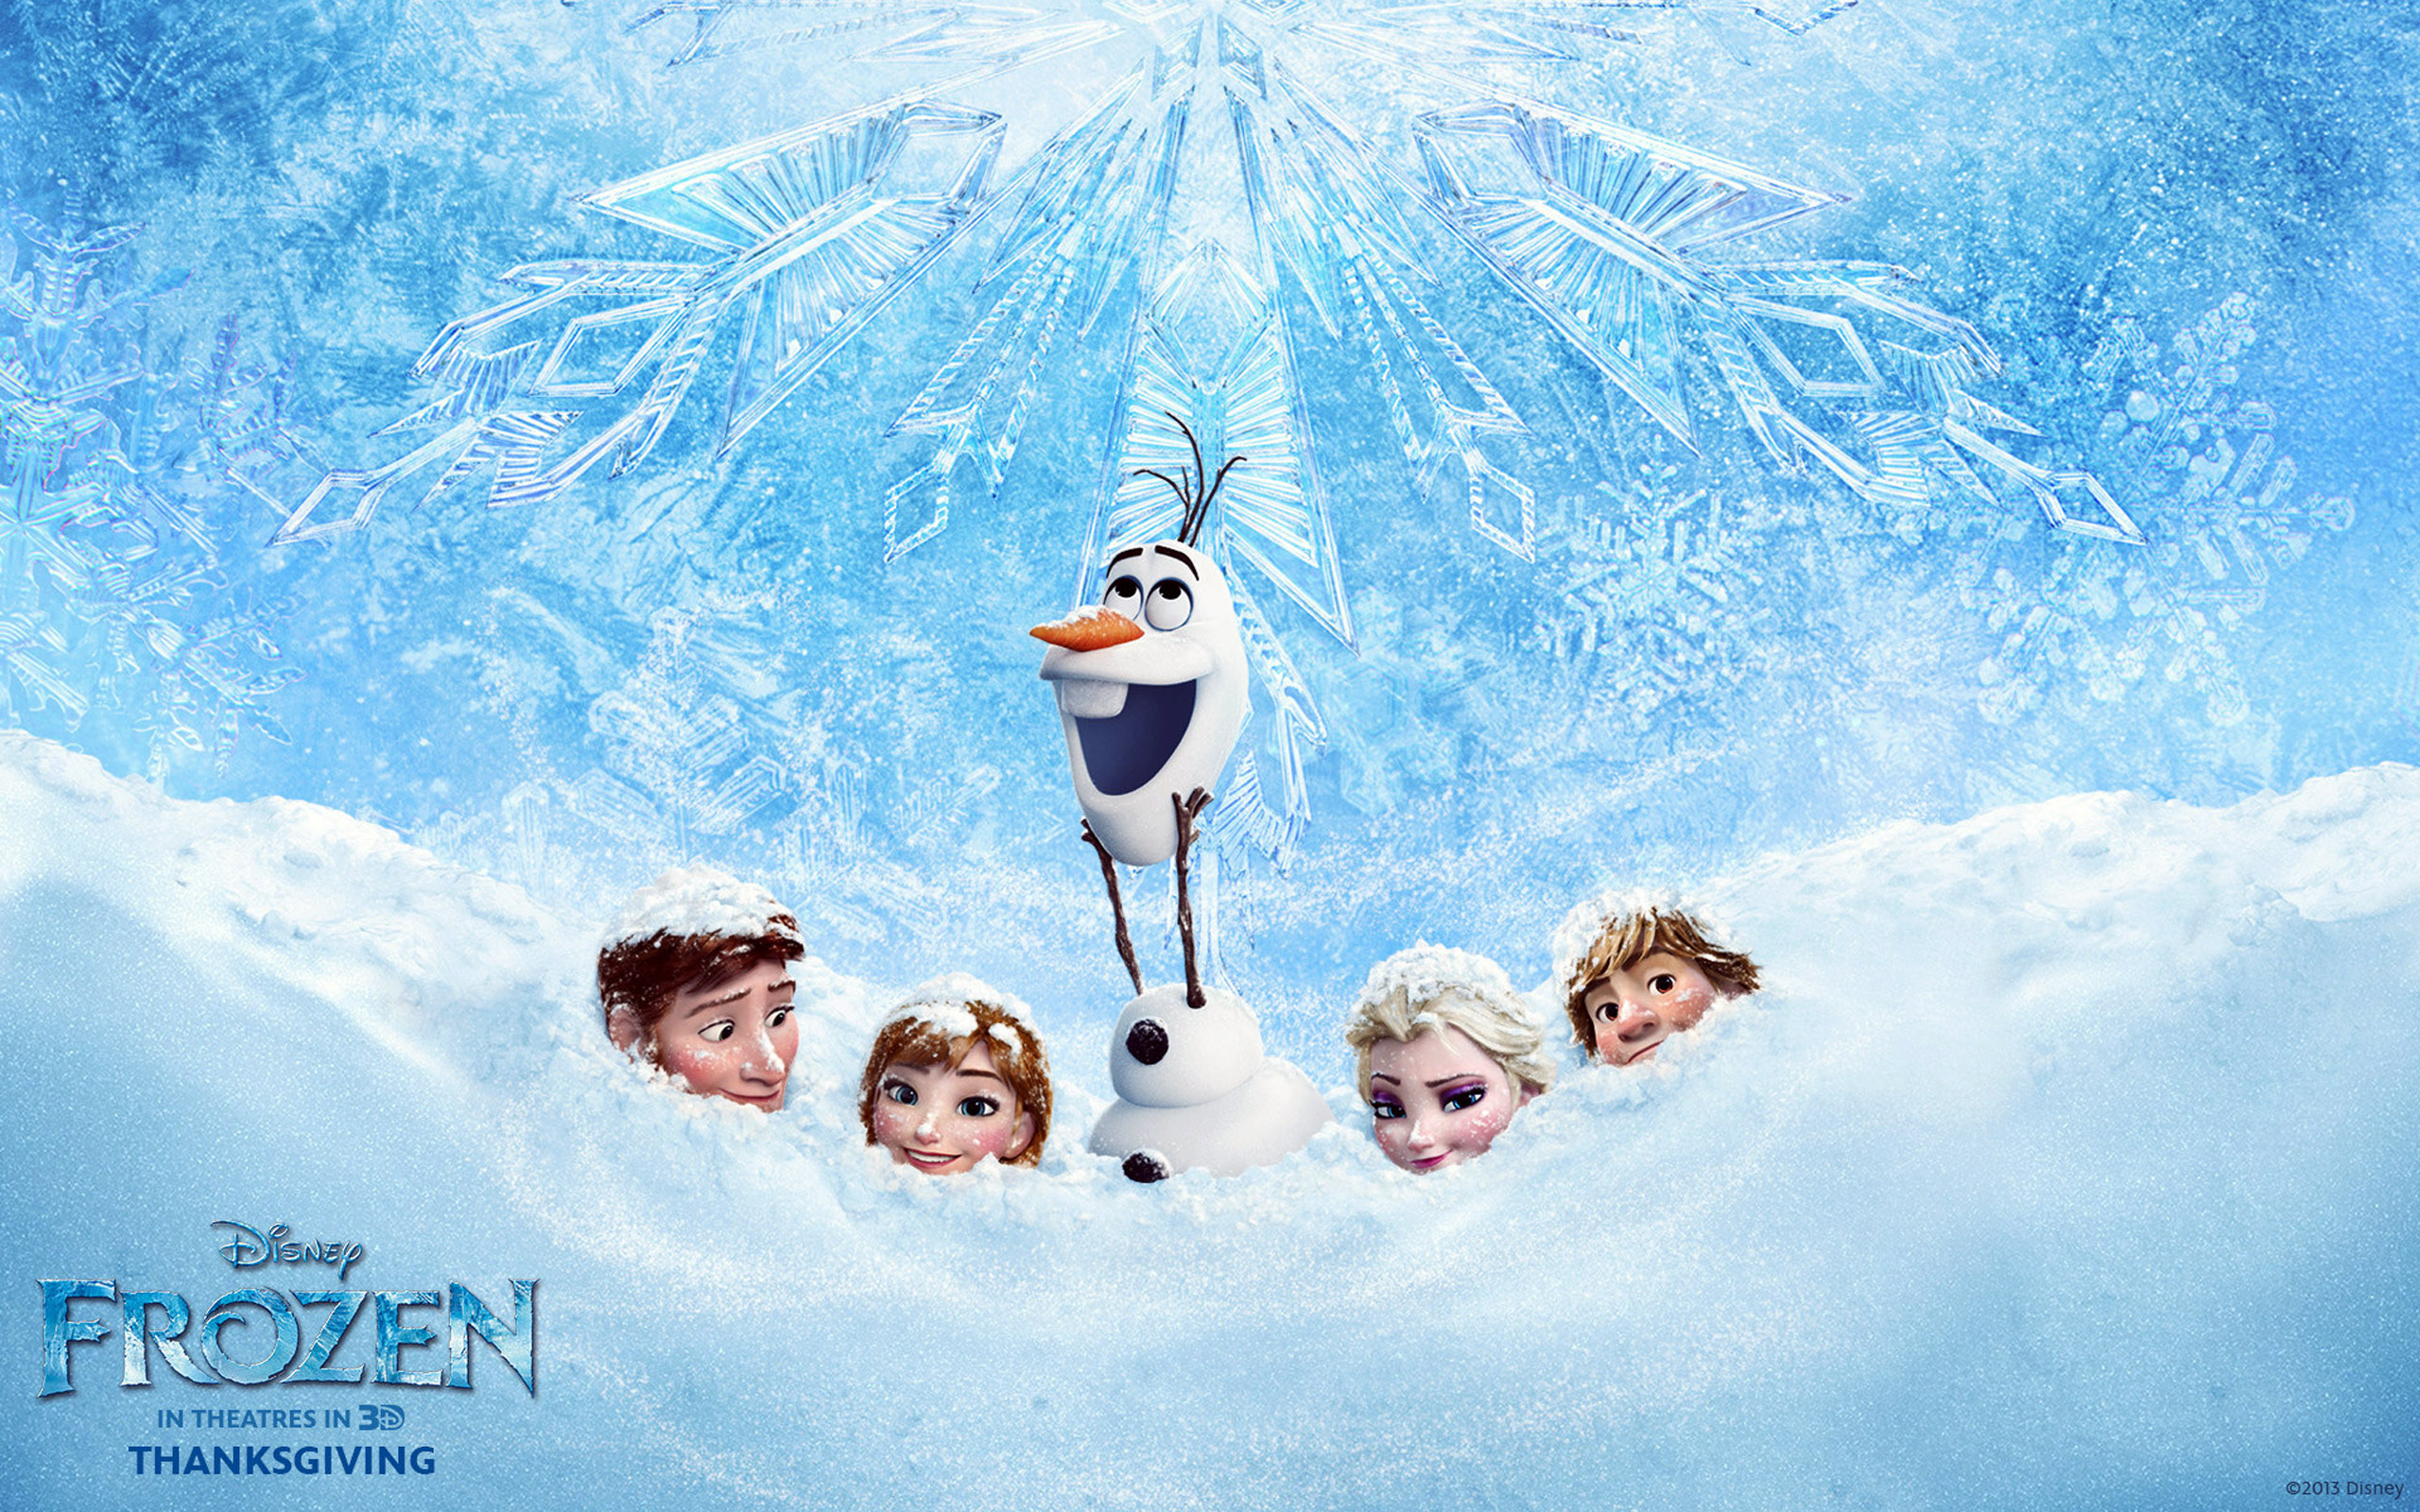 hinh nen frozen elsa 26